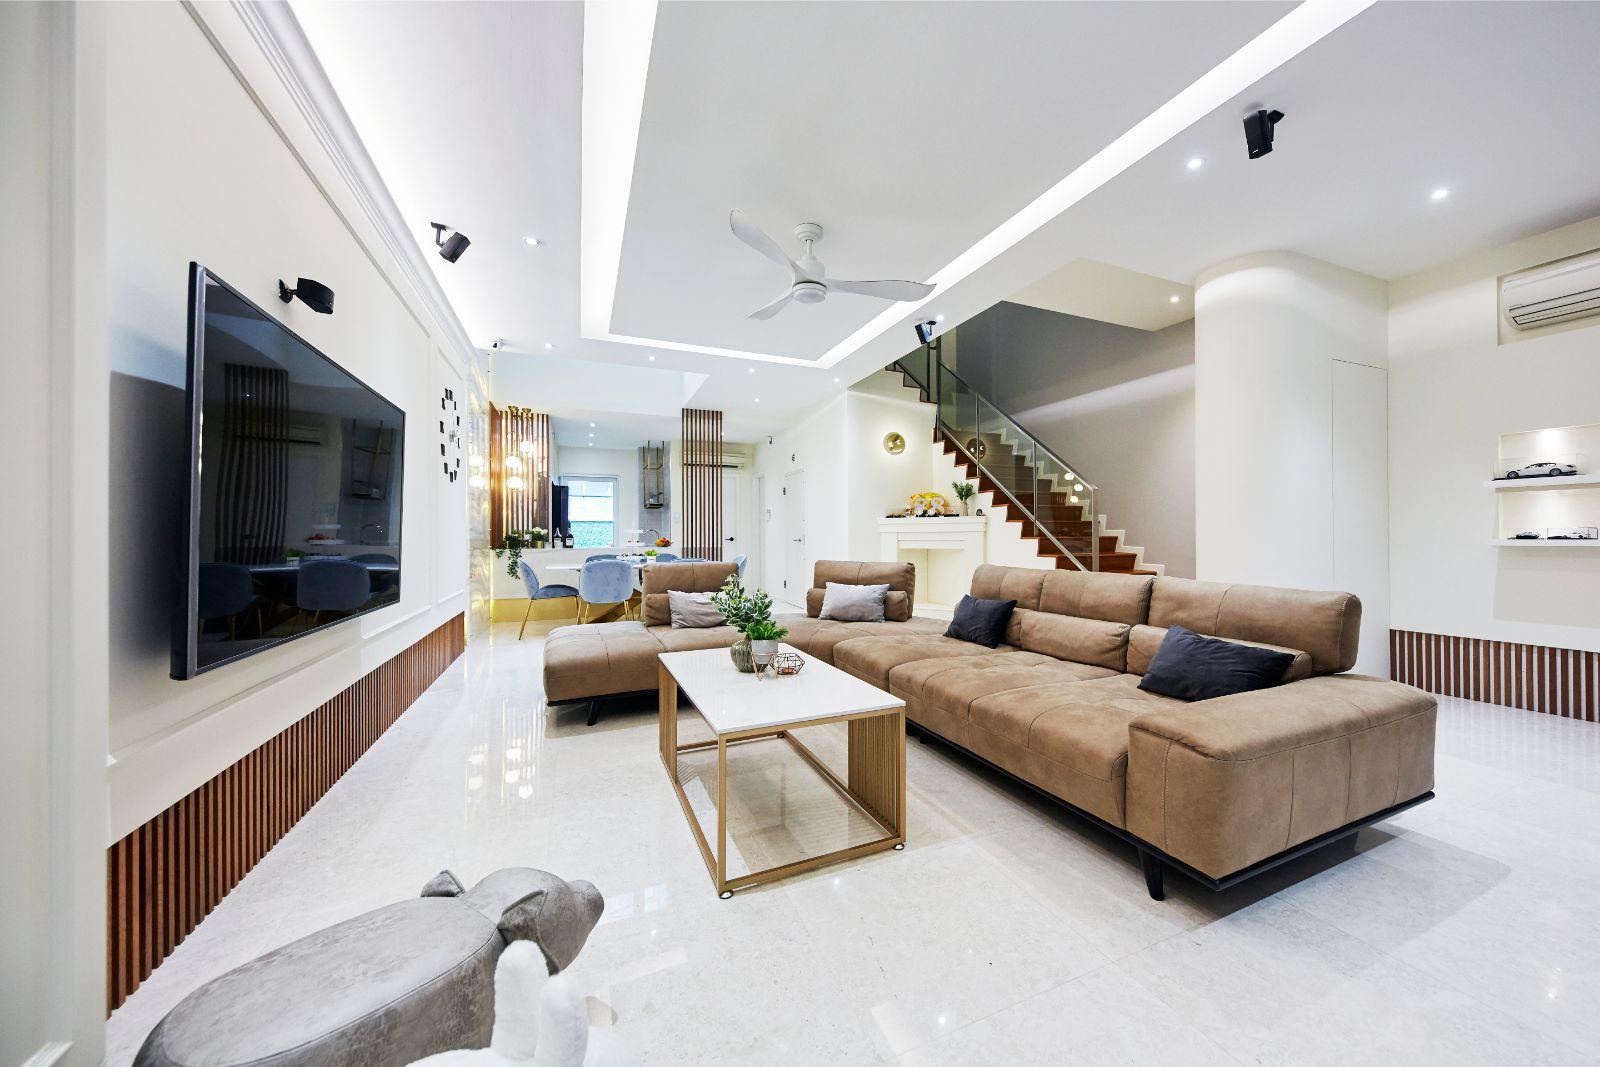 Carpenters top interior design company landed luxury